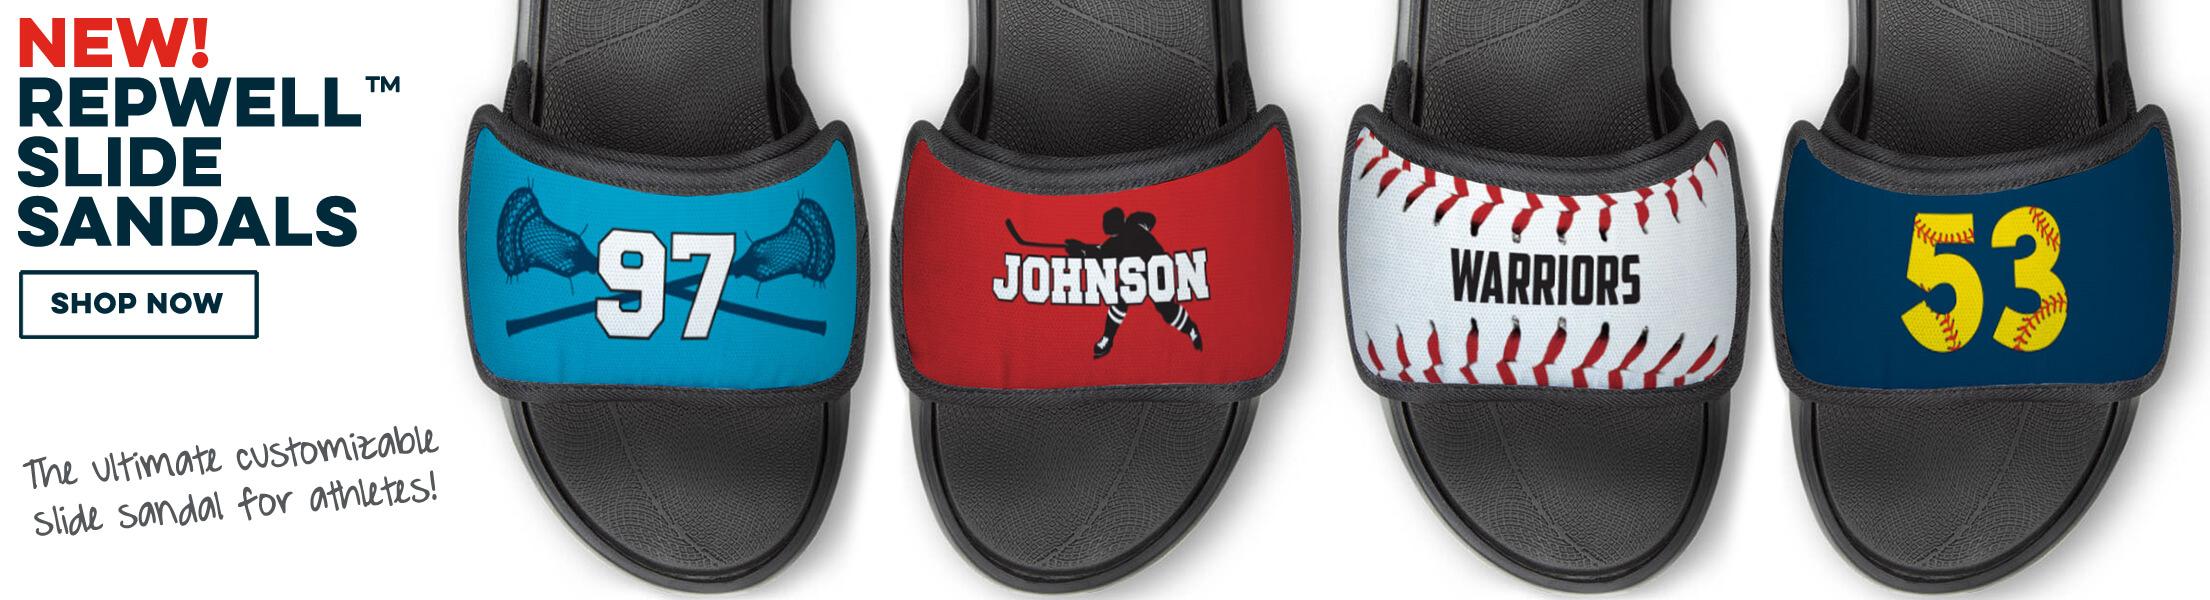 Repwell™ Slide Sandals